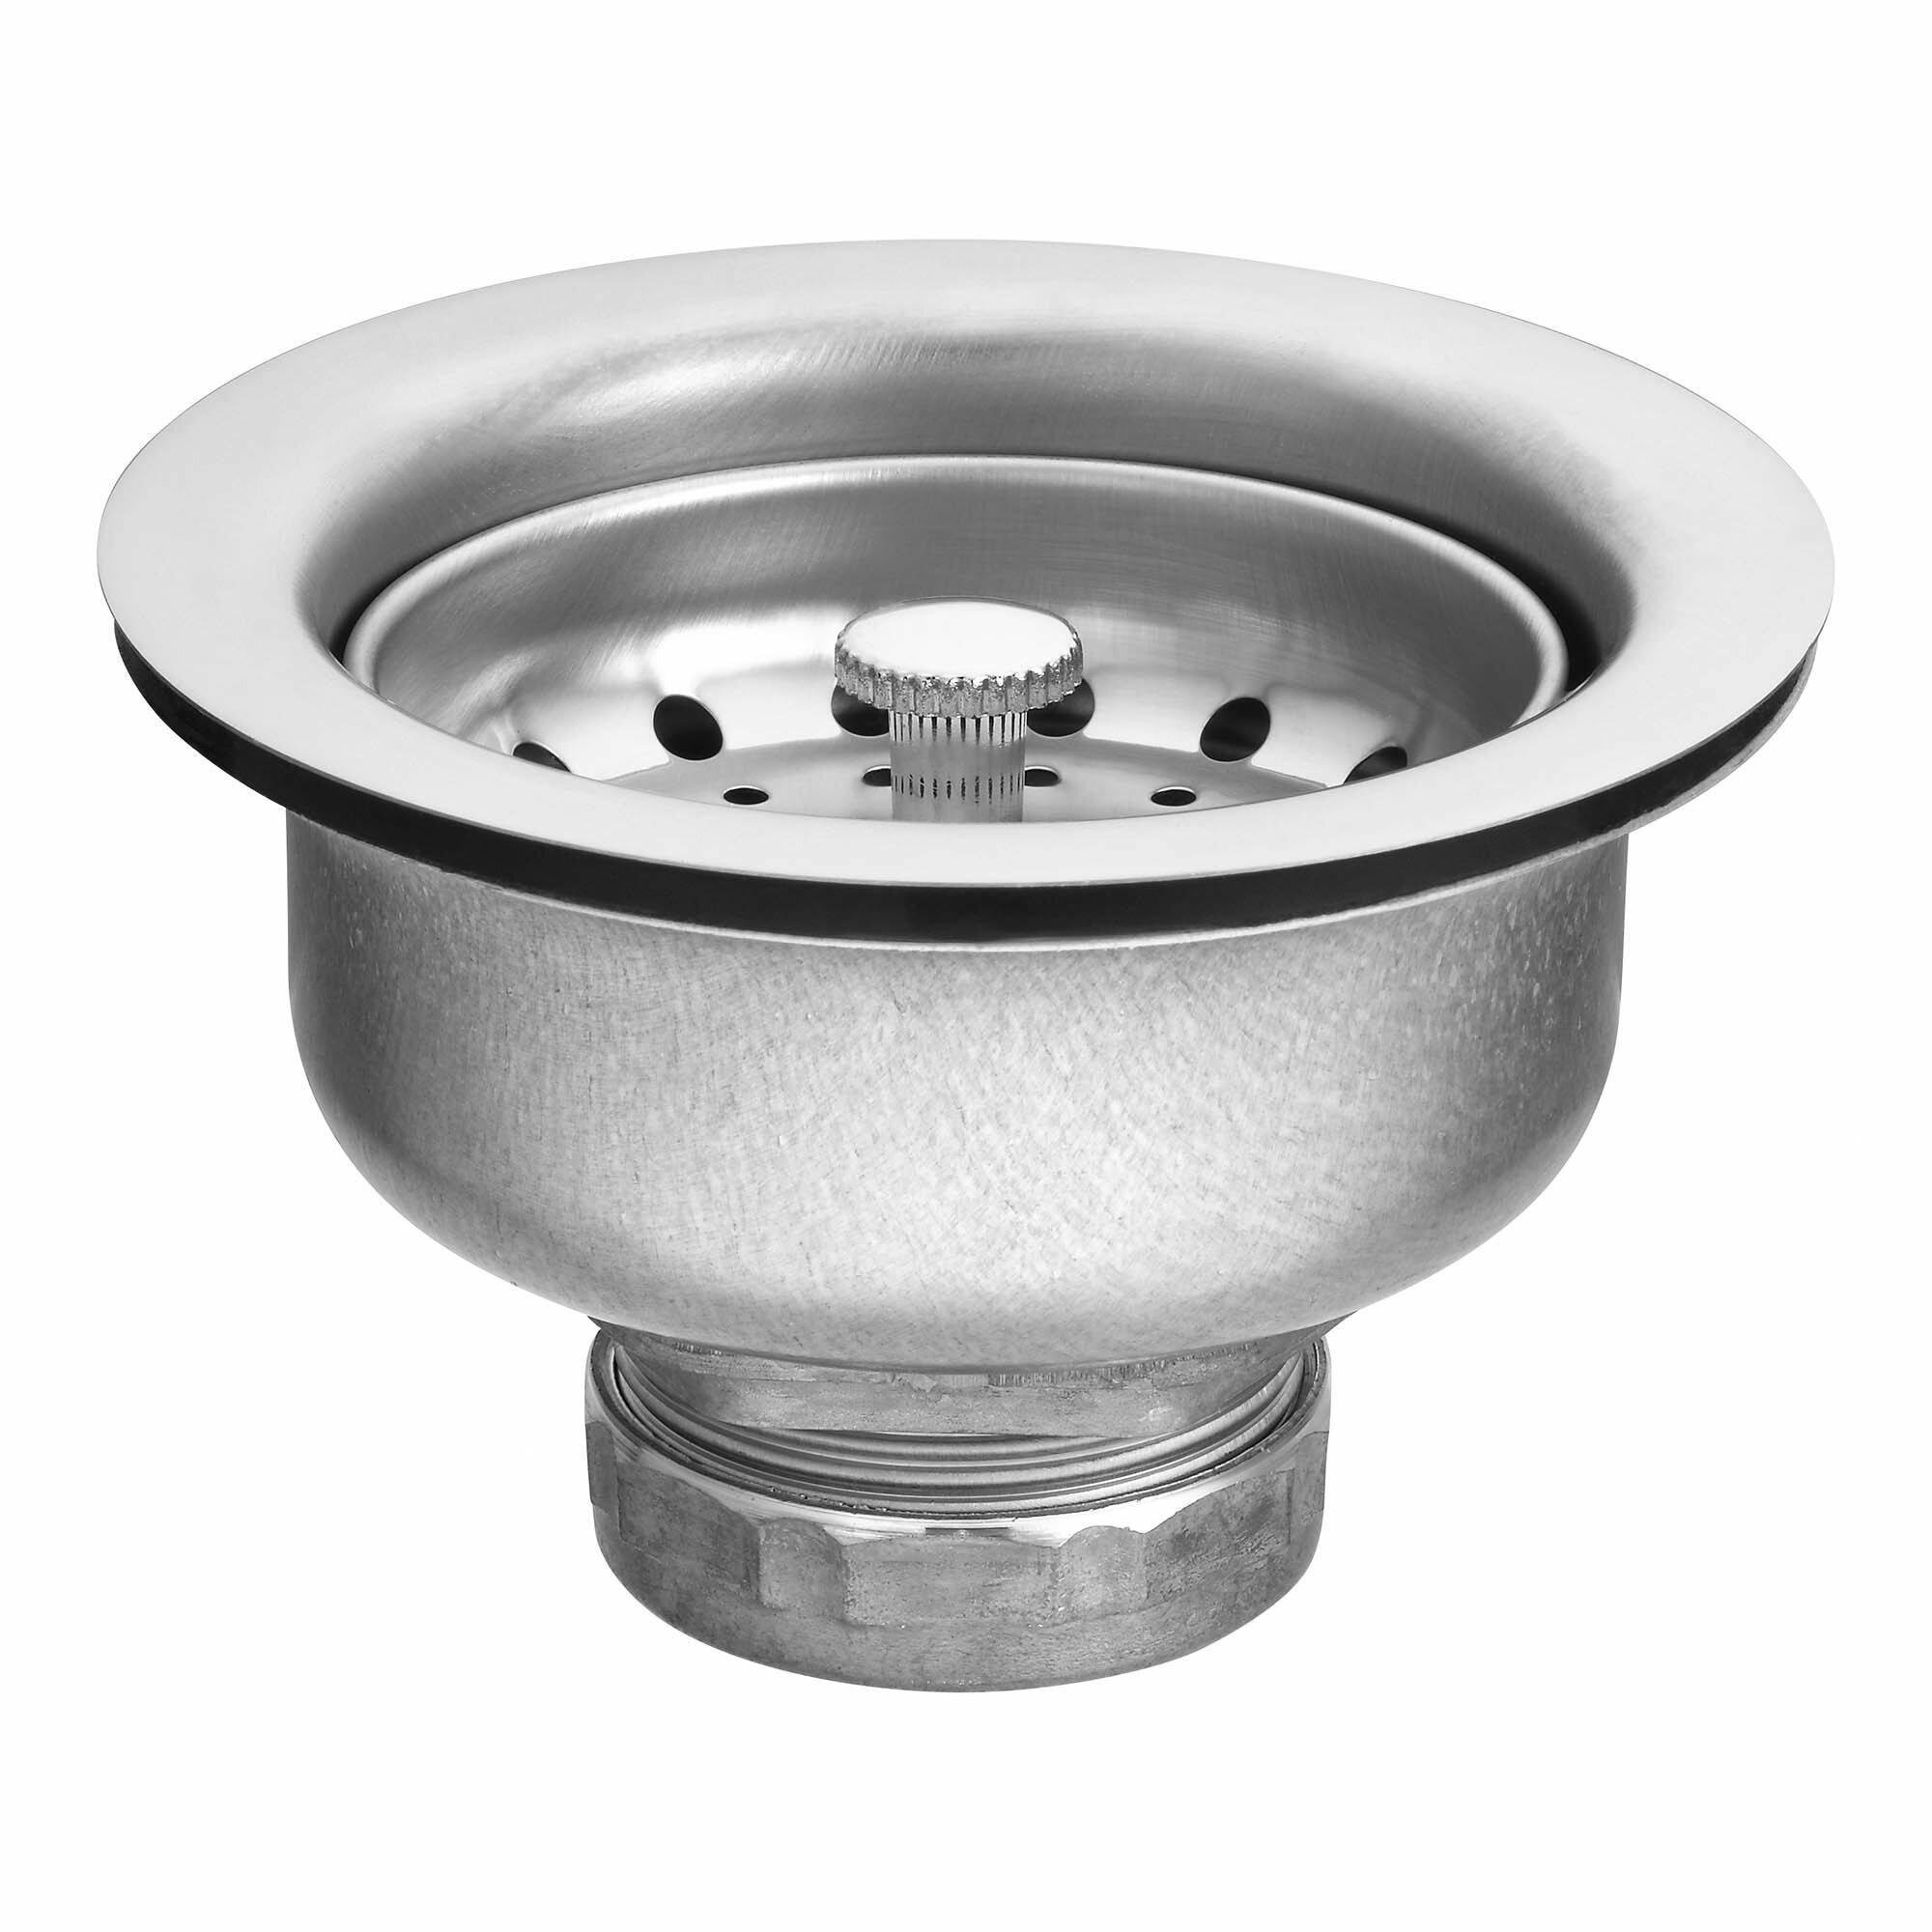 Moen Moen Basket Strainer Kitchen Sink Drain & Reviews